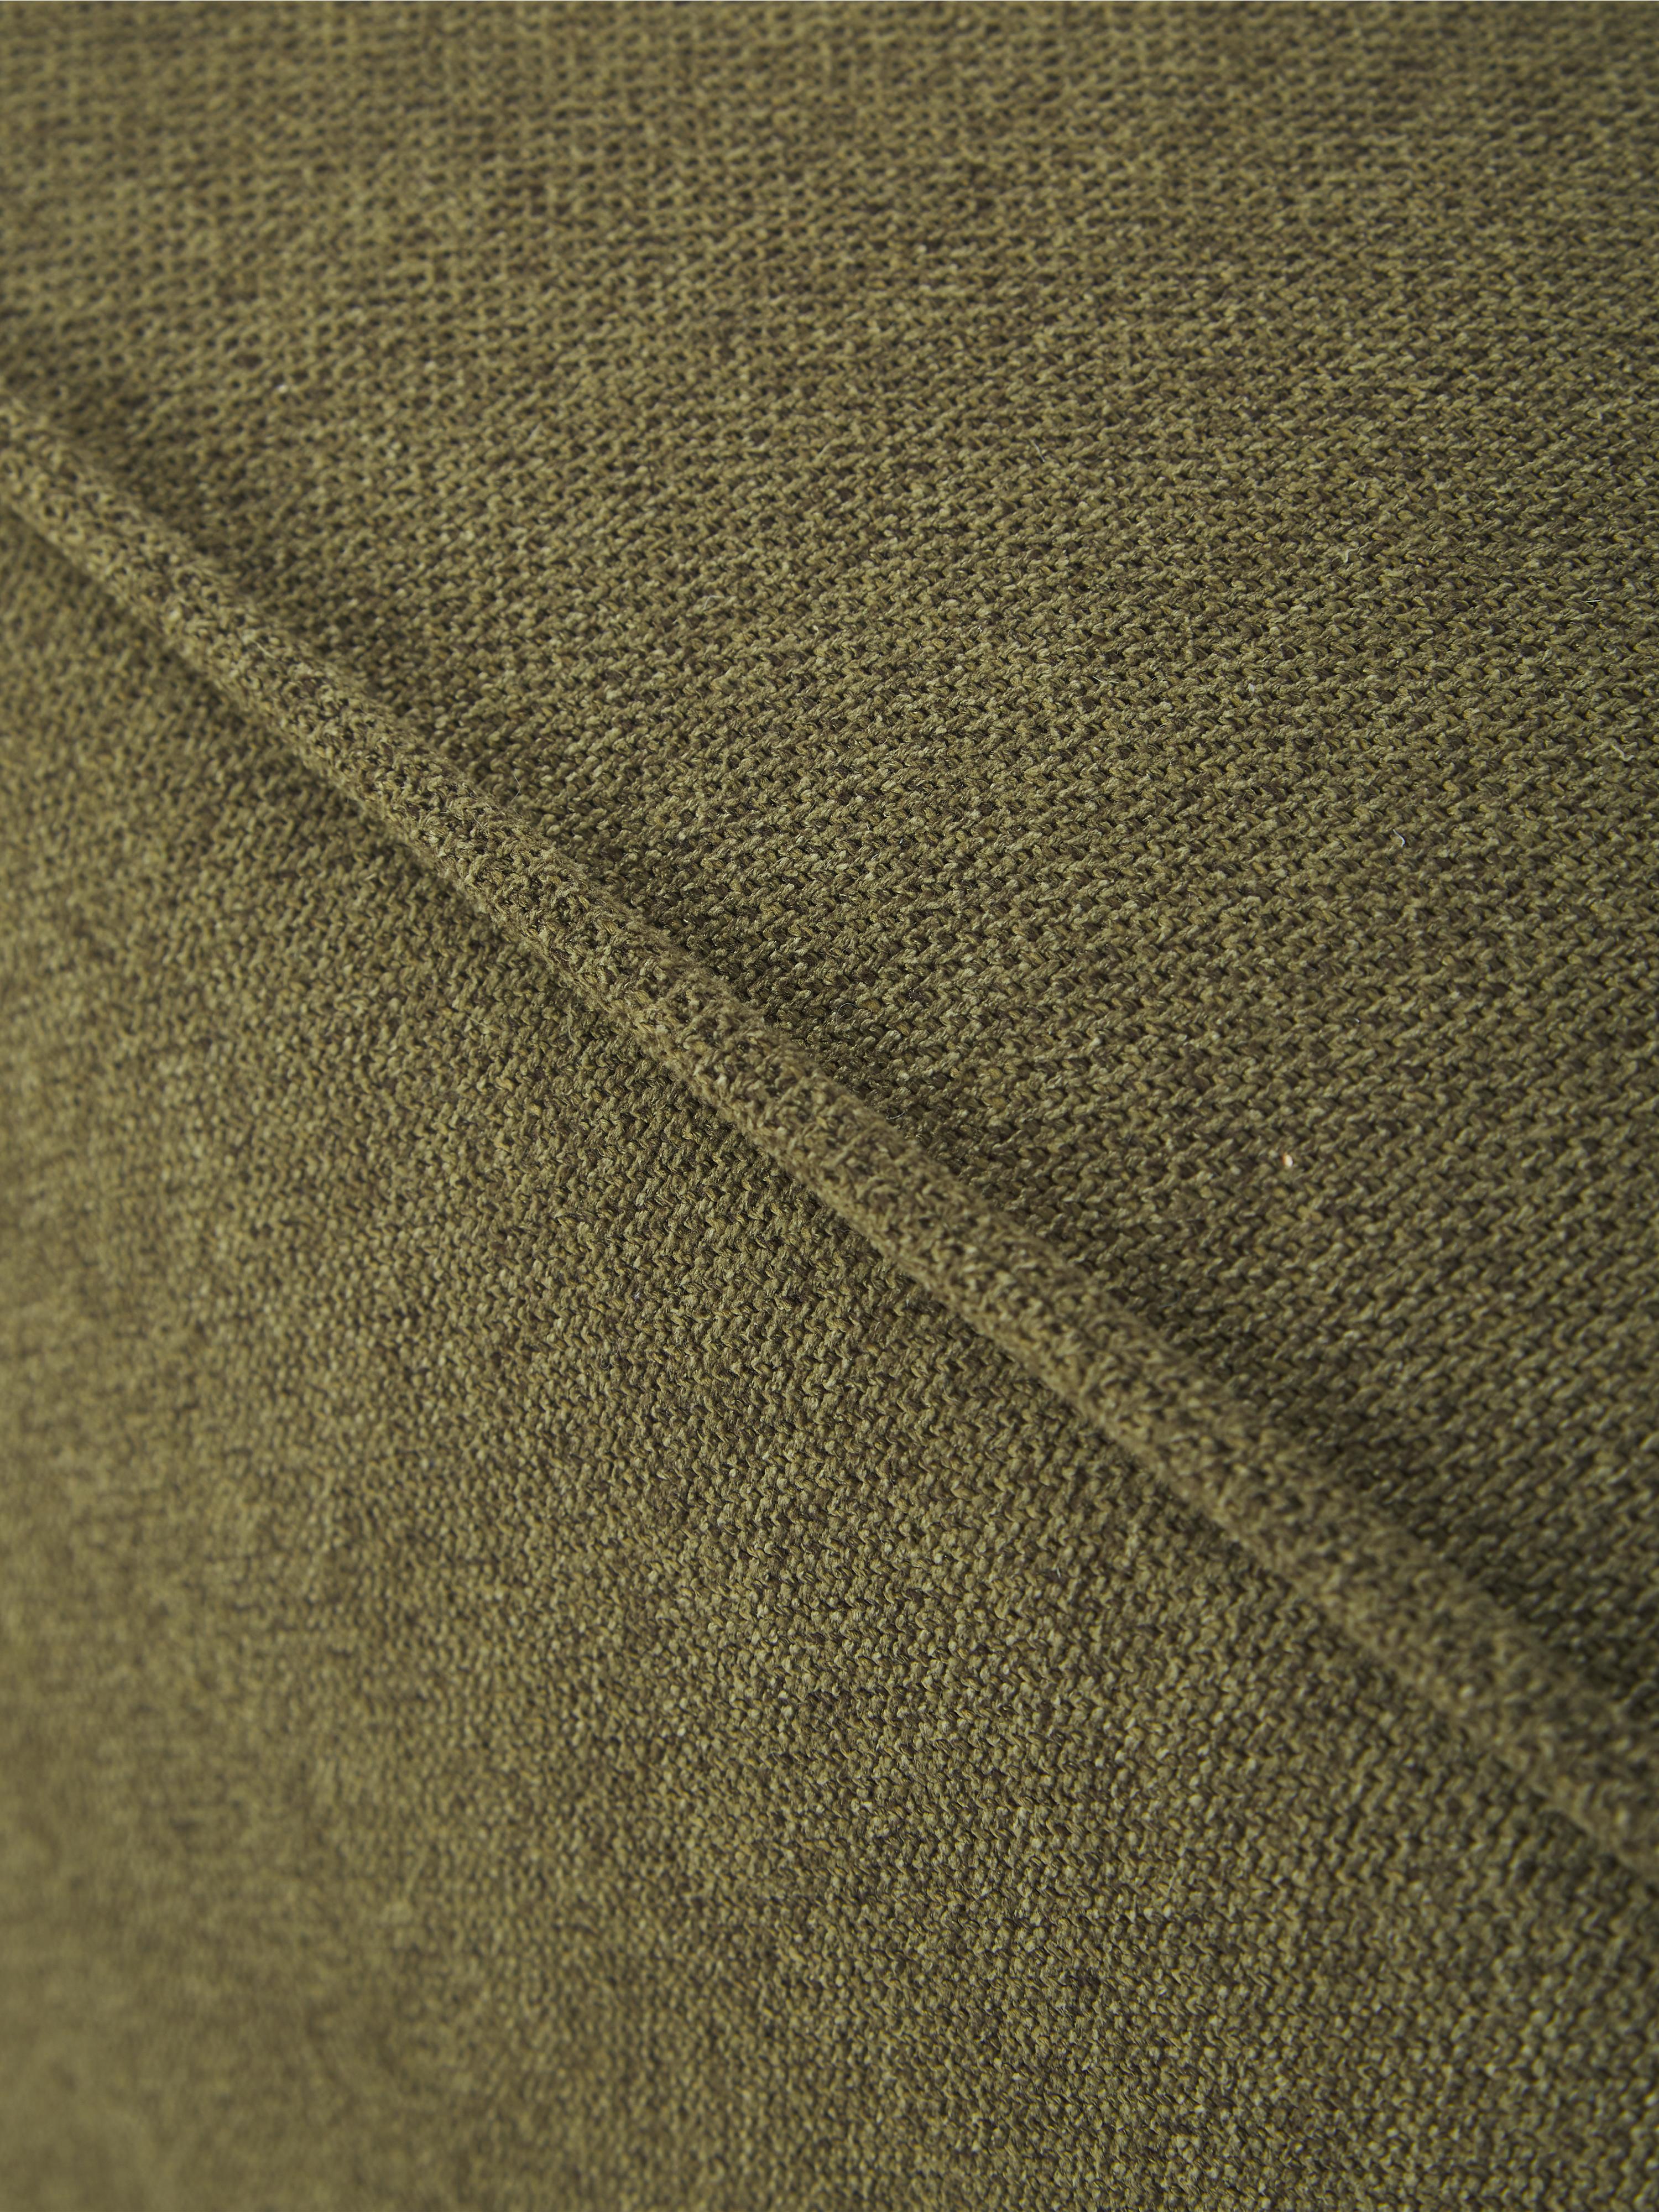 Modulares Ecksofa Lennon, Bezug: Polyester Der hochwertige, Gestell: Massives Kiefernholz, Spe, Füße: Kunststoff, Webstoff Grün, B 326 x T 207 cm